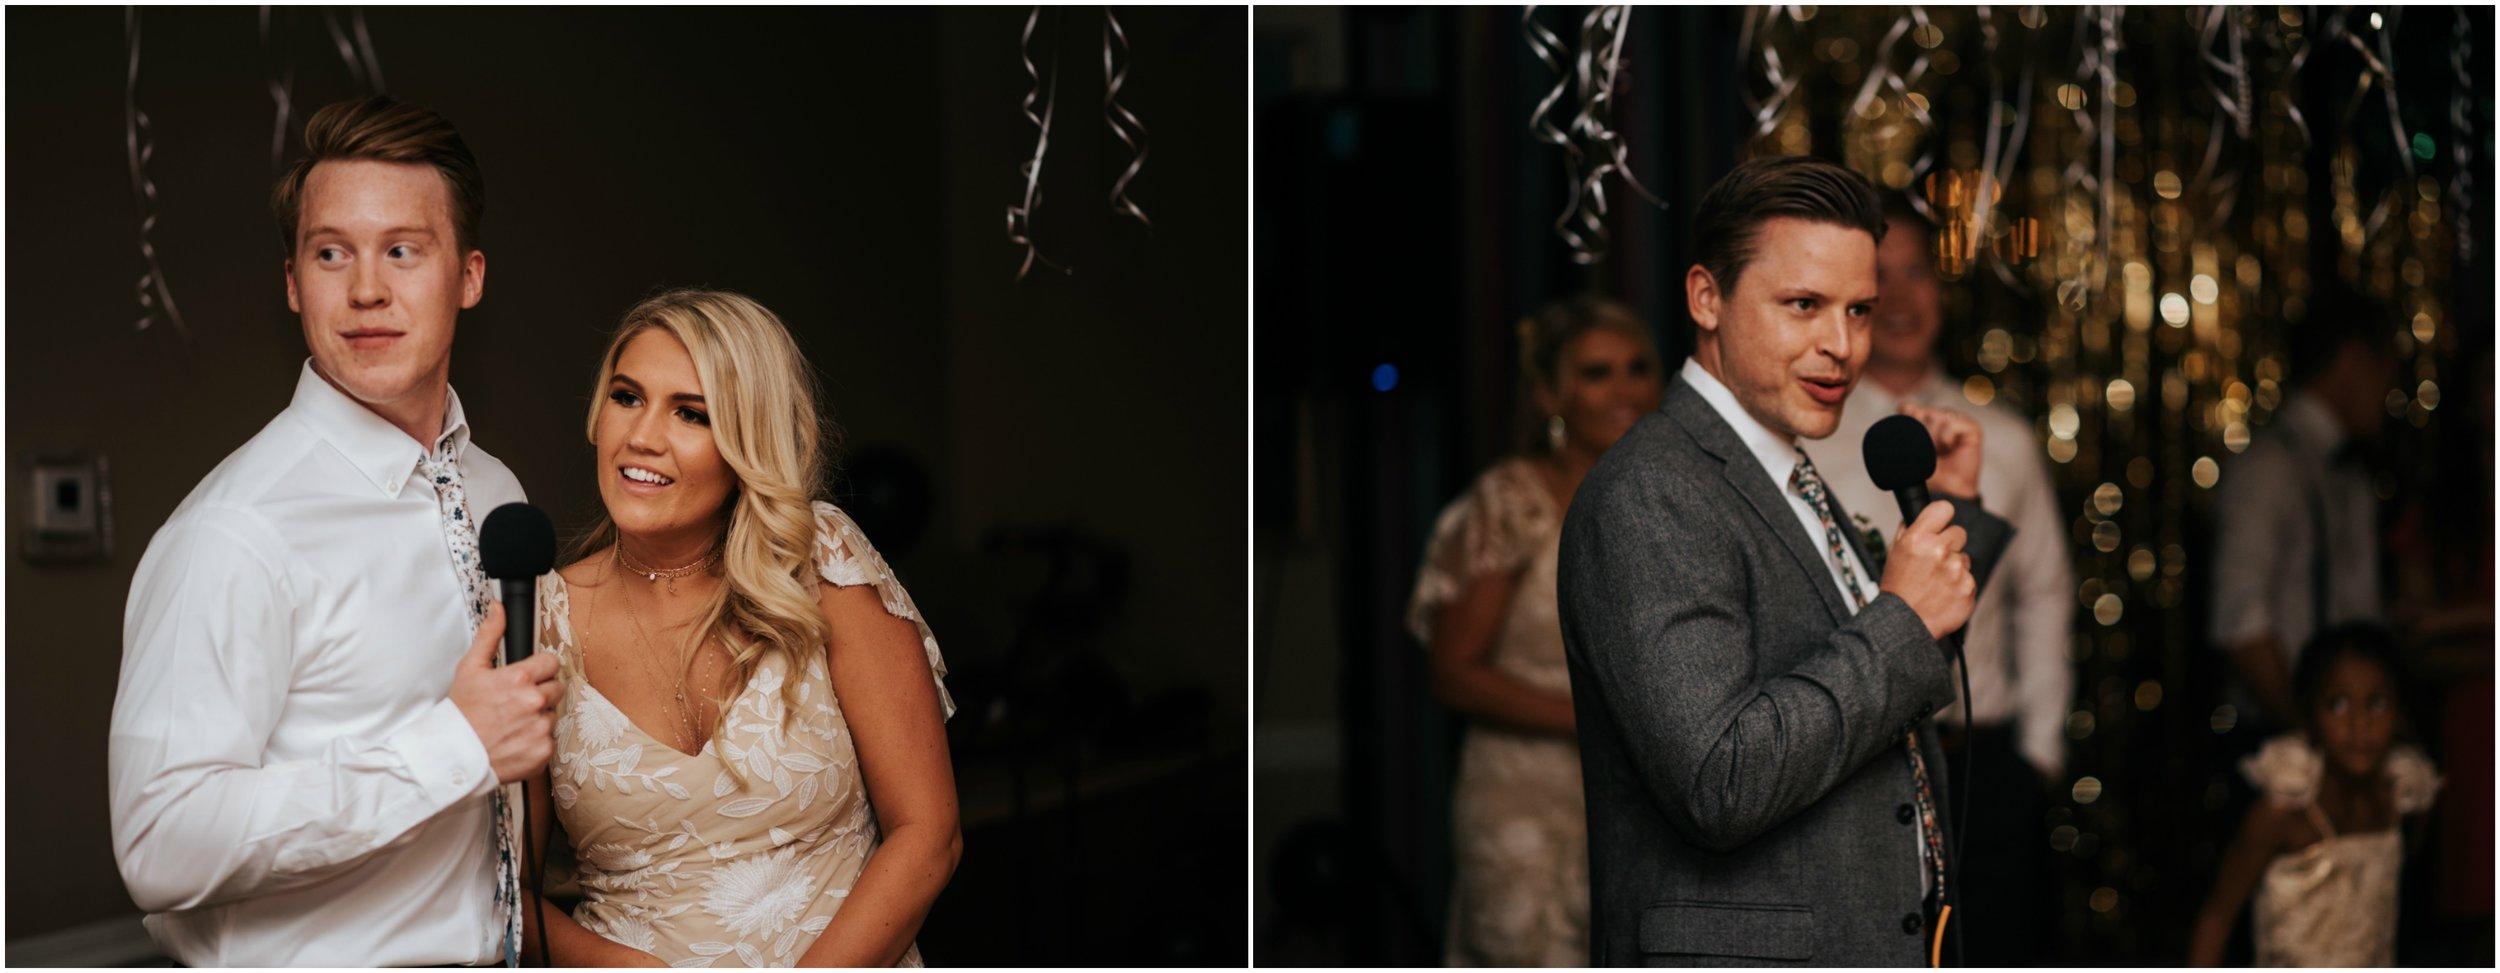 zayda-collin-wedding-candids.jpg